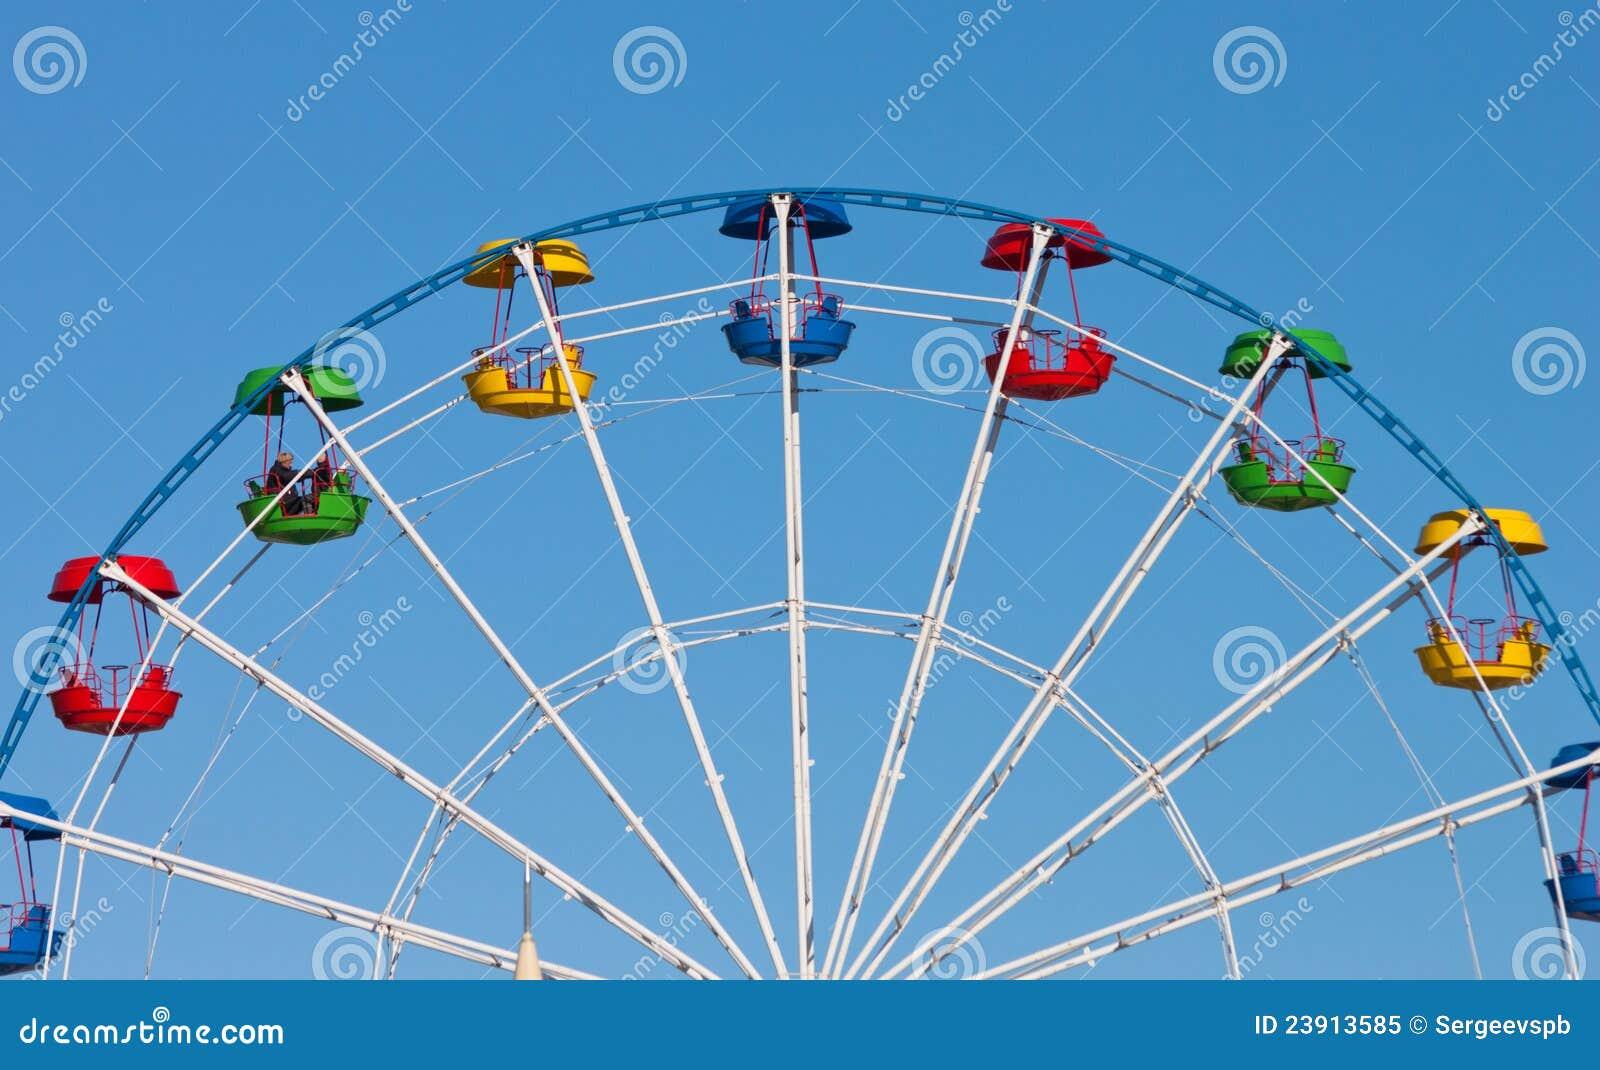 Download Attraction Ferris wheel stock image. Image of amusement - 23913585